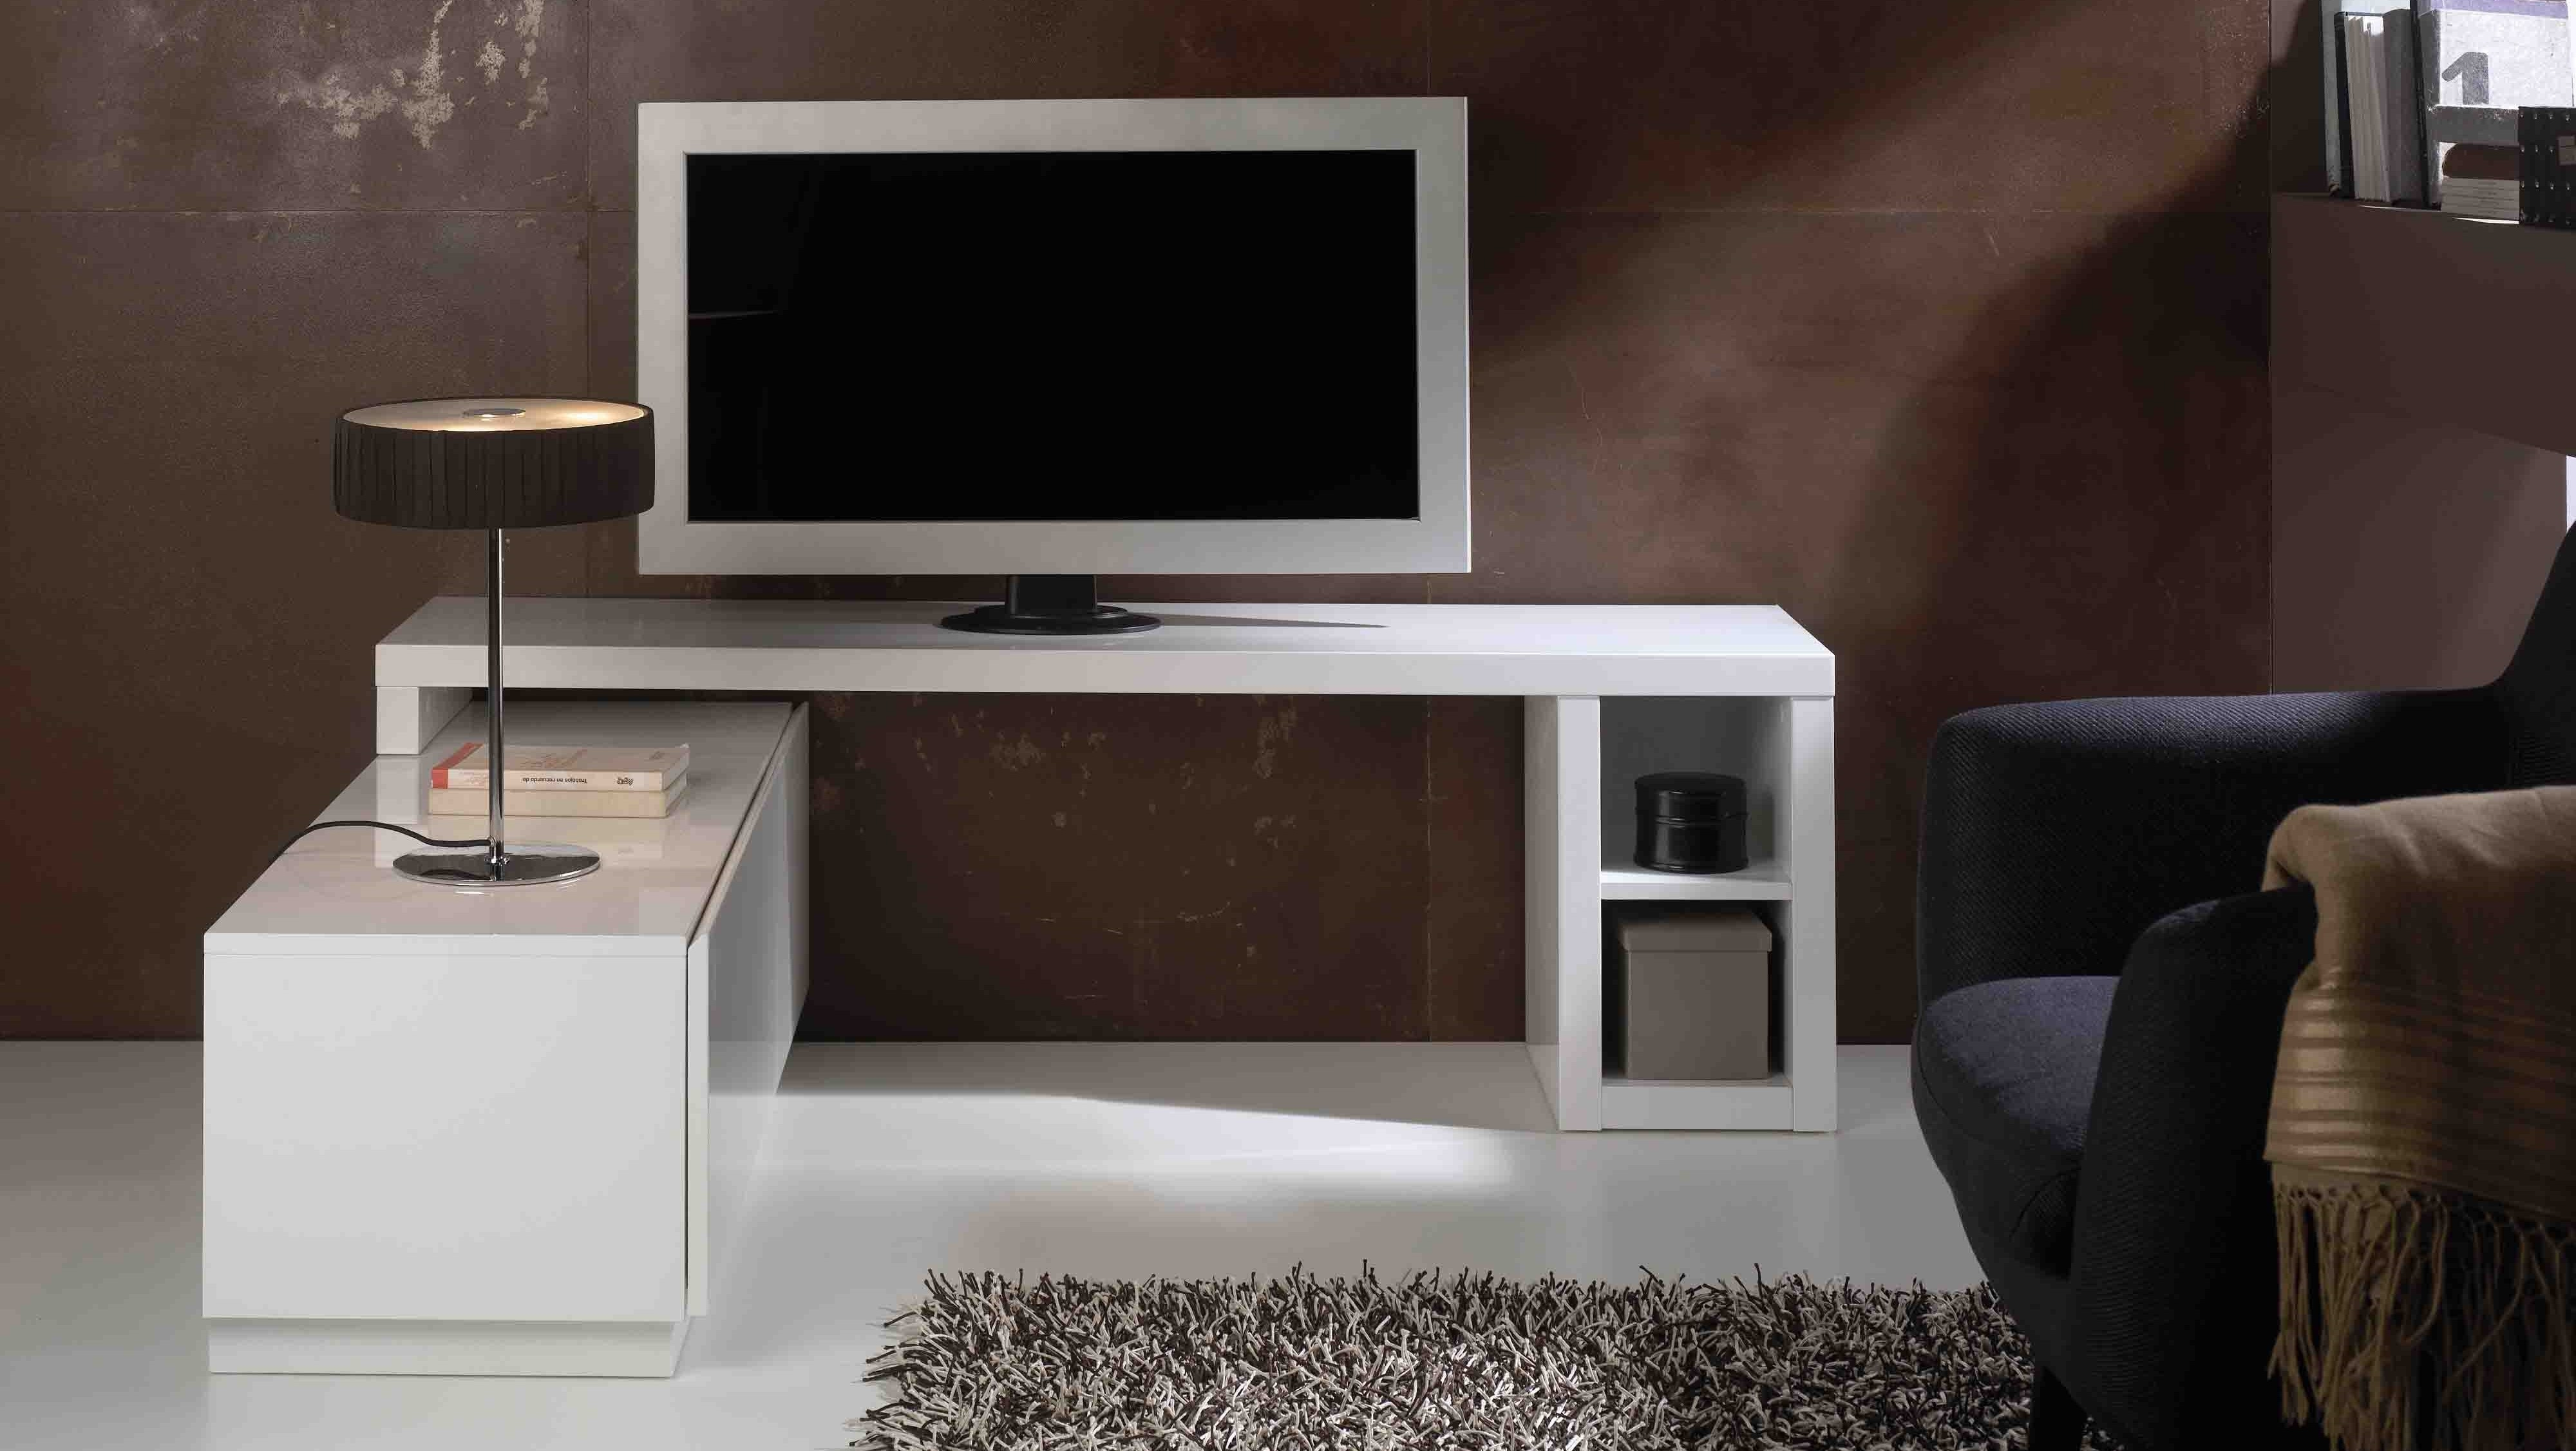 Meuble Tv Design Et Banc Tv Moderne Petits Prix Gdegdesign # Meuble Tele D'Angle Blanc Laque